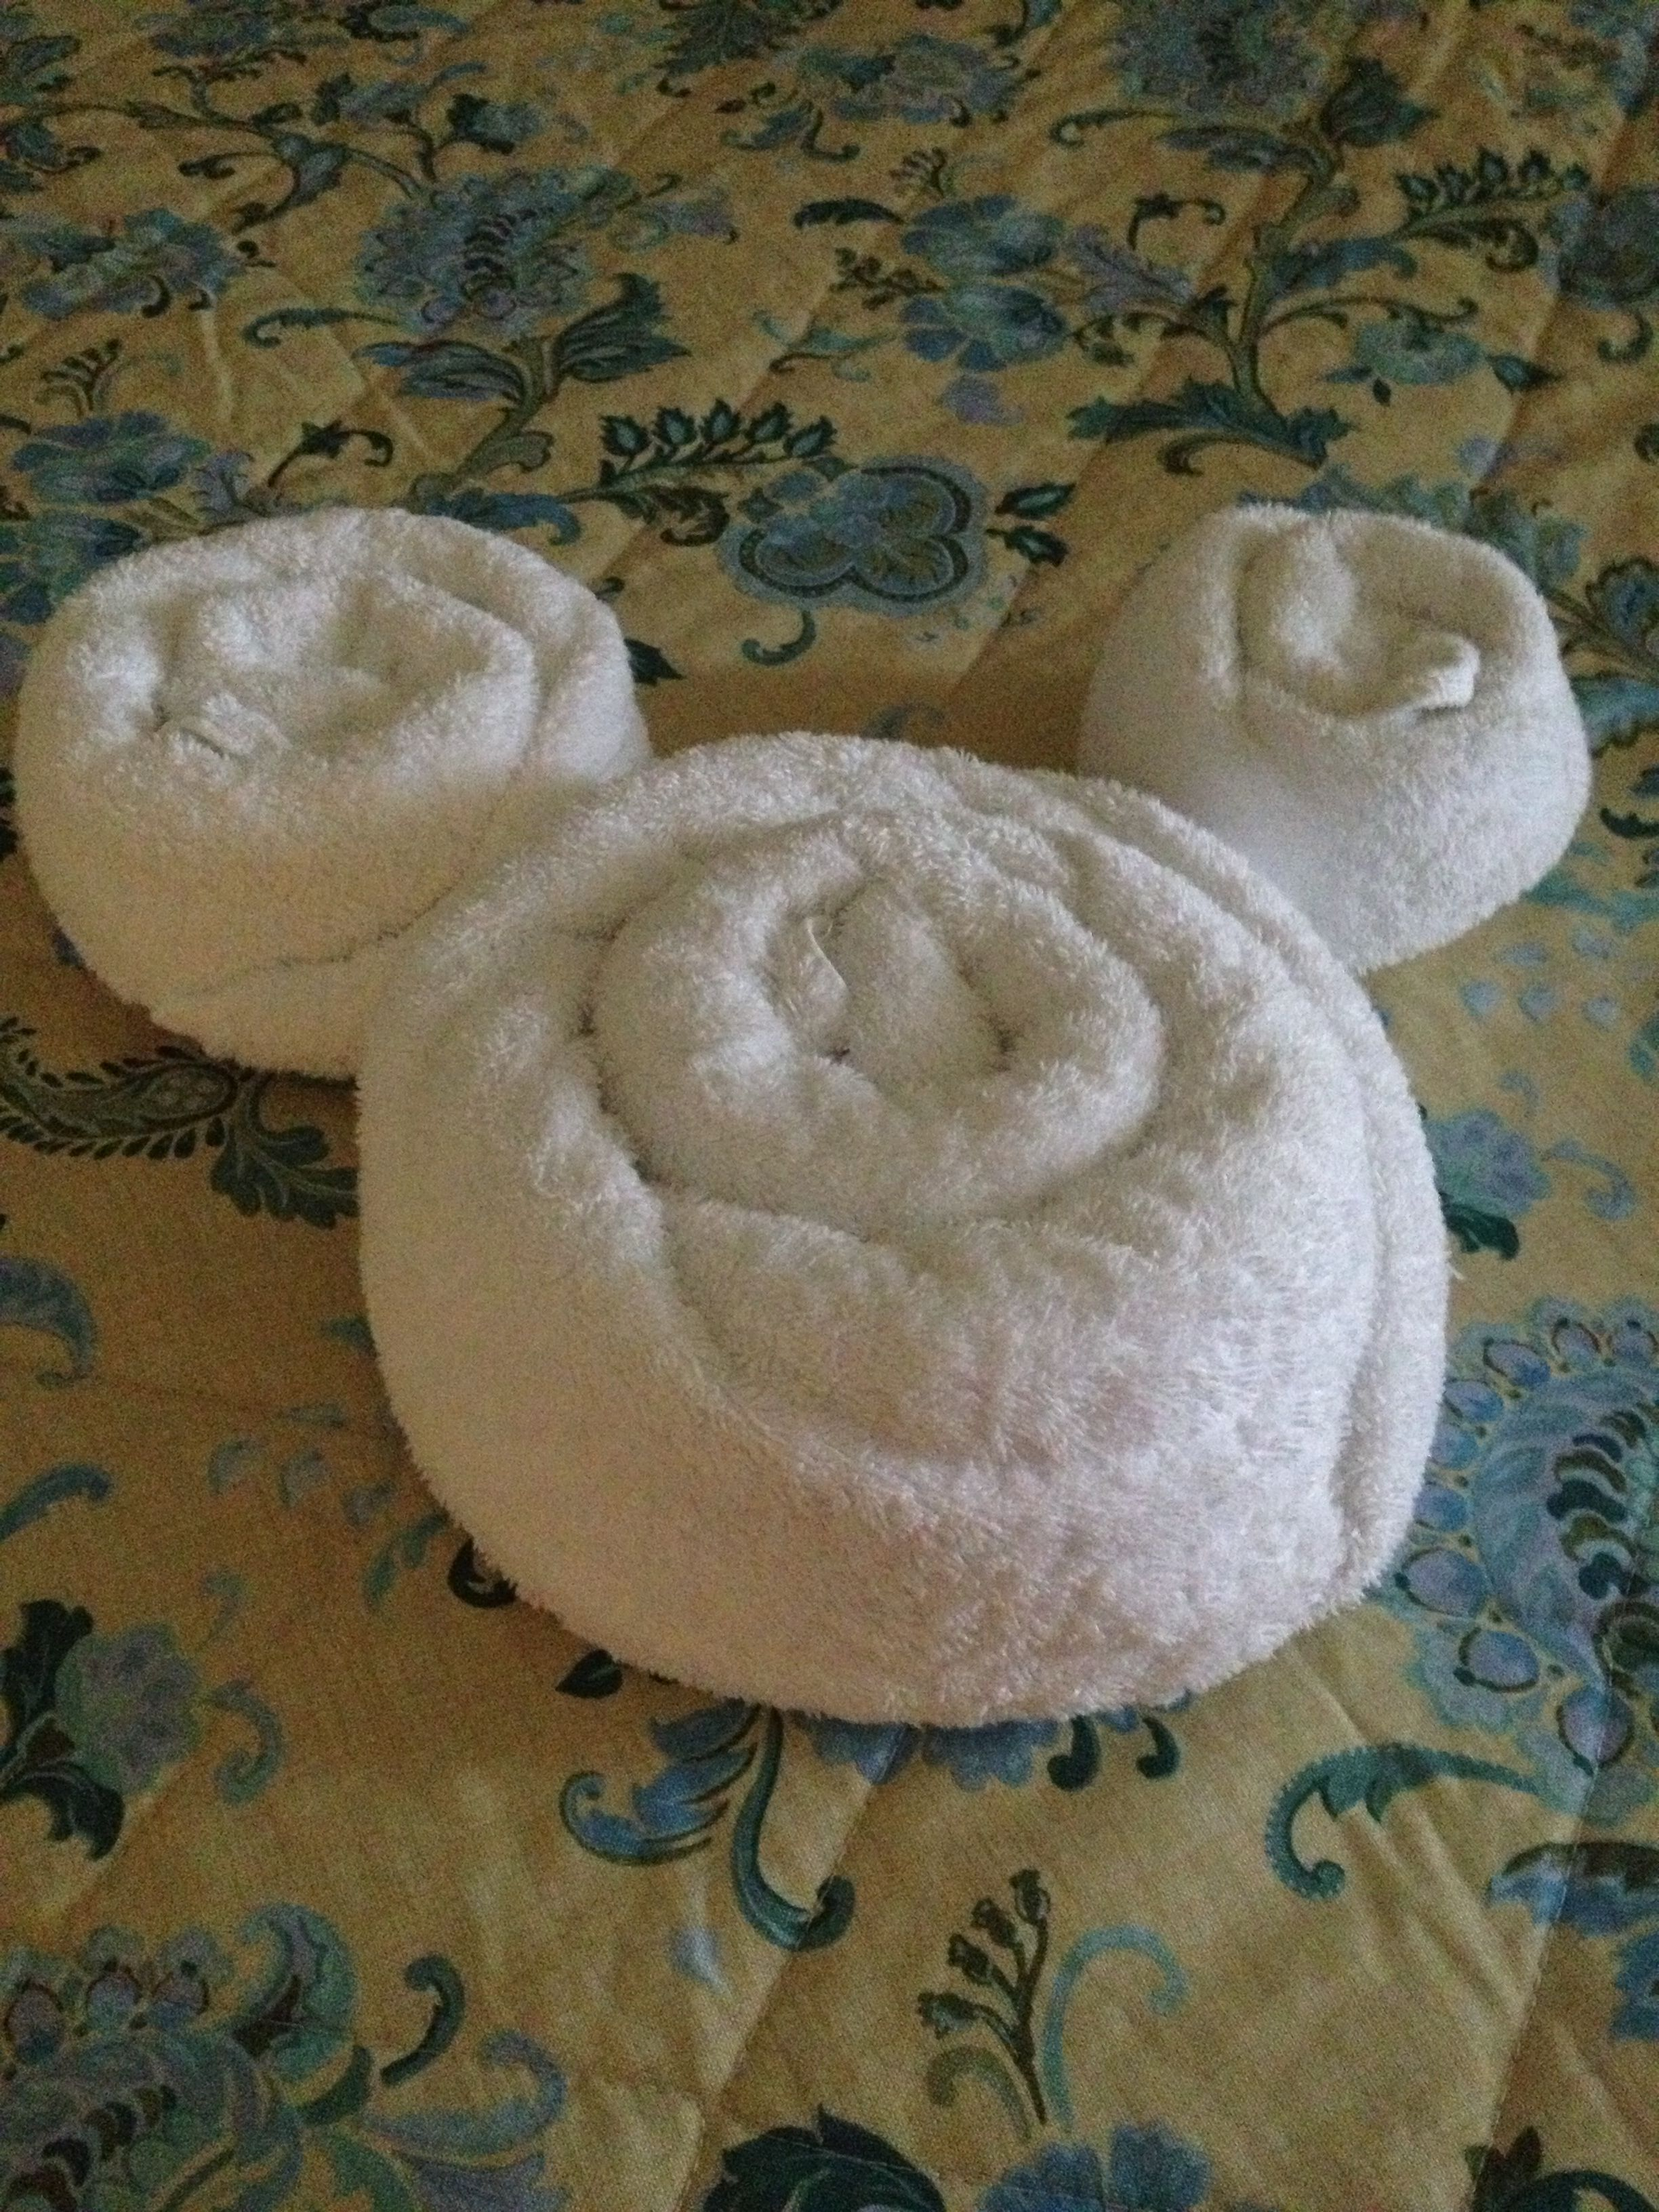 Disney Folded Towel Shaped As Mickey Mouse Cute Disney